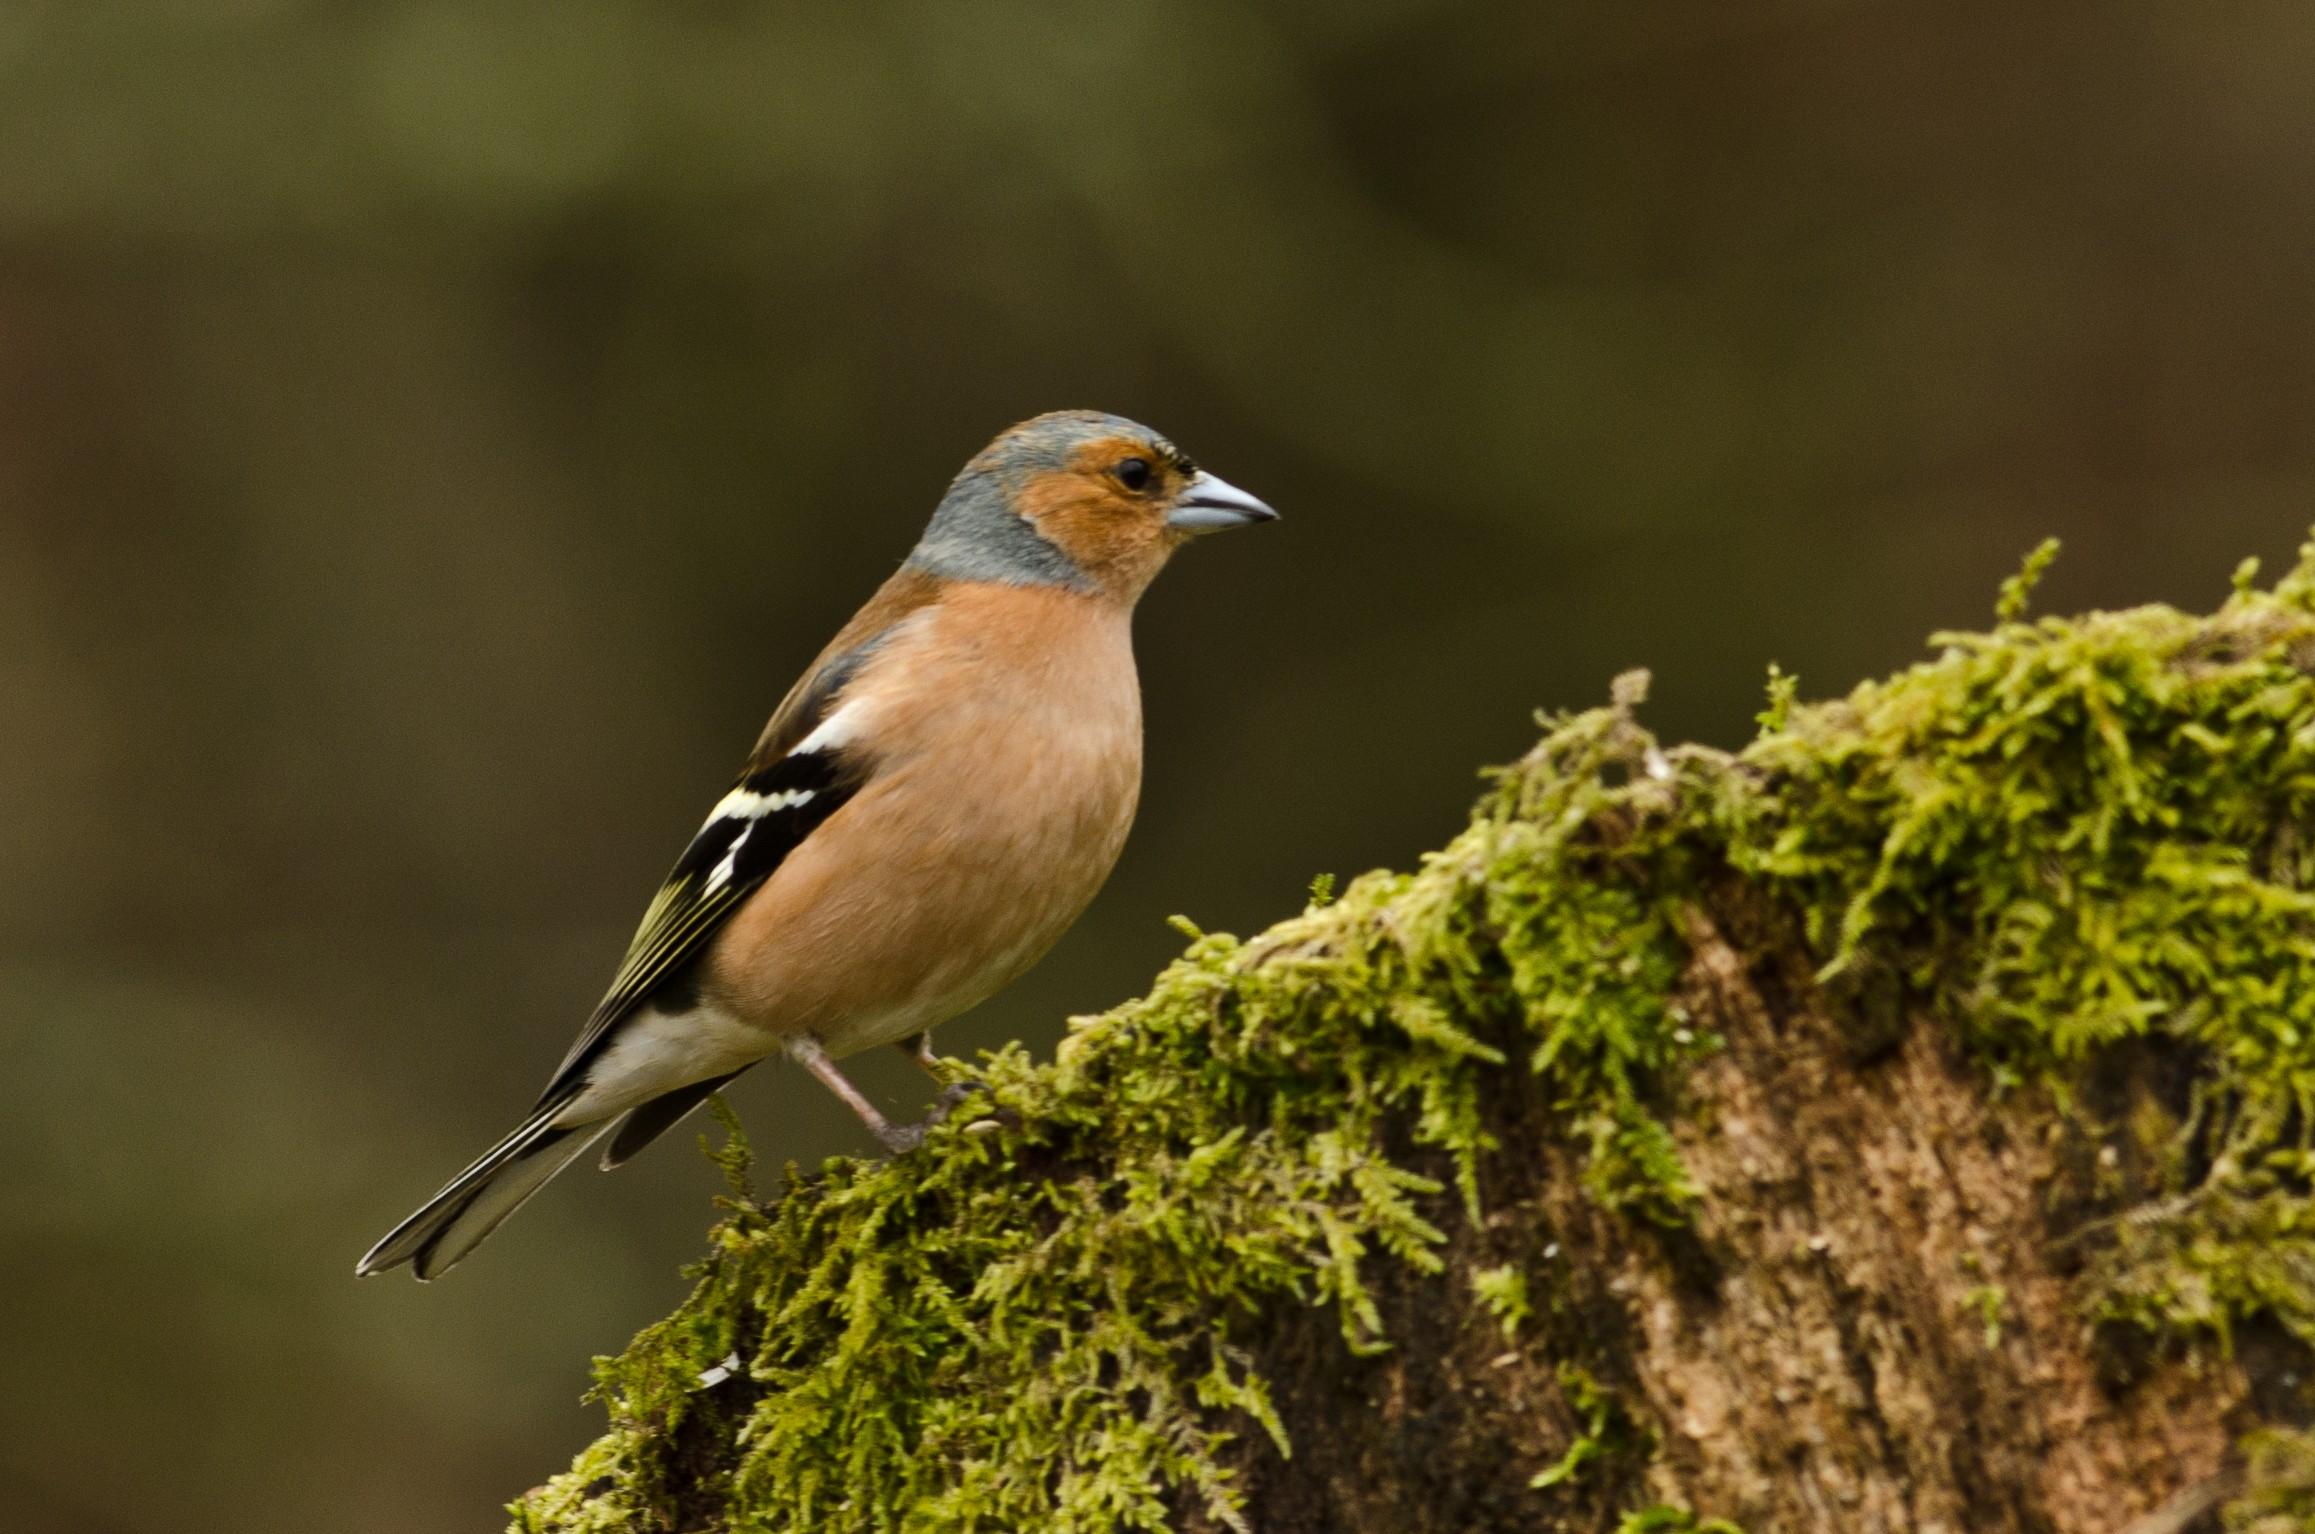 Radnor bird blog